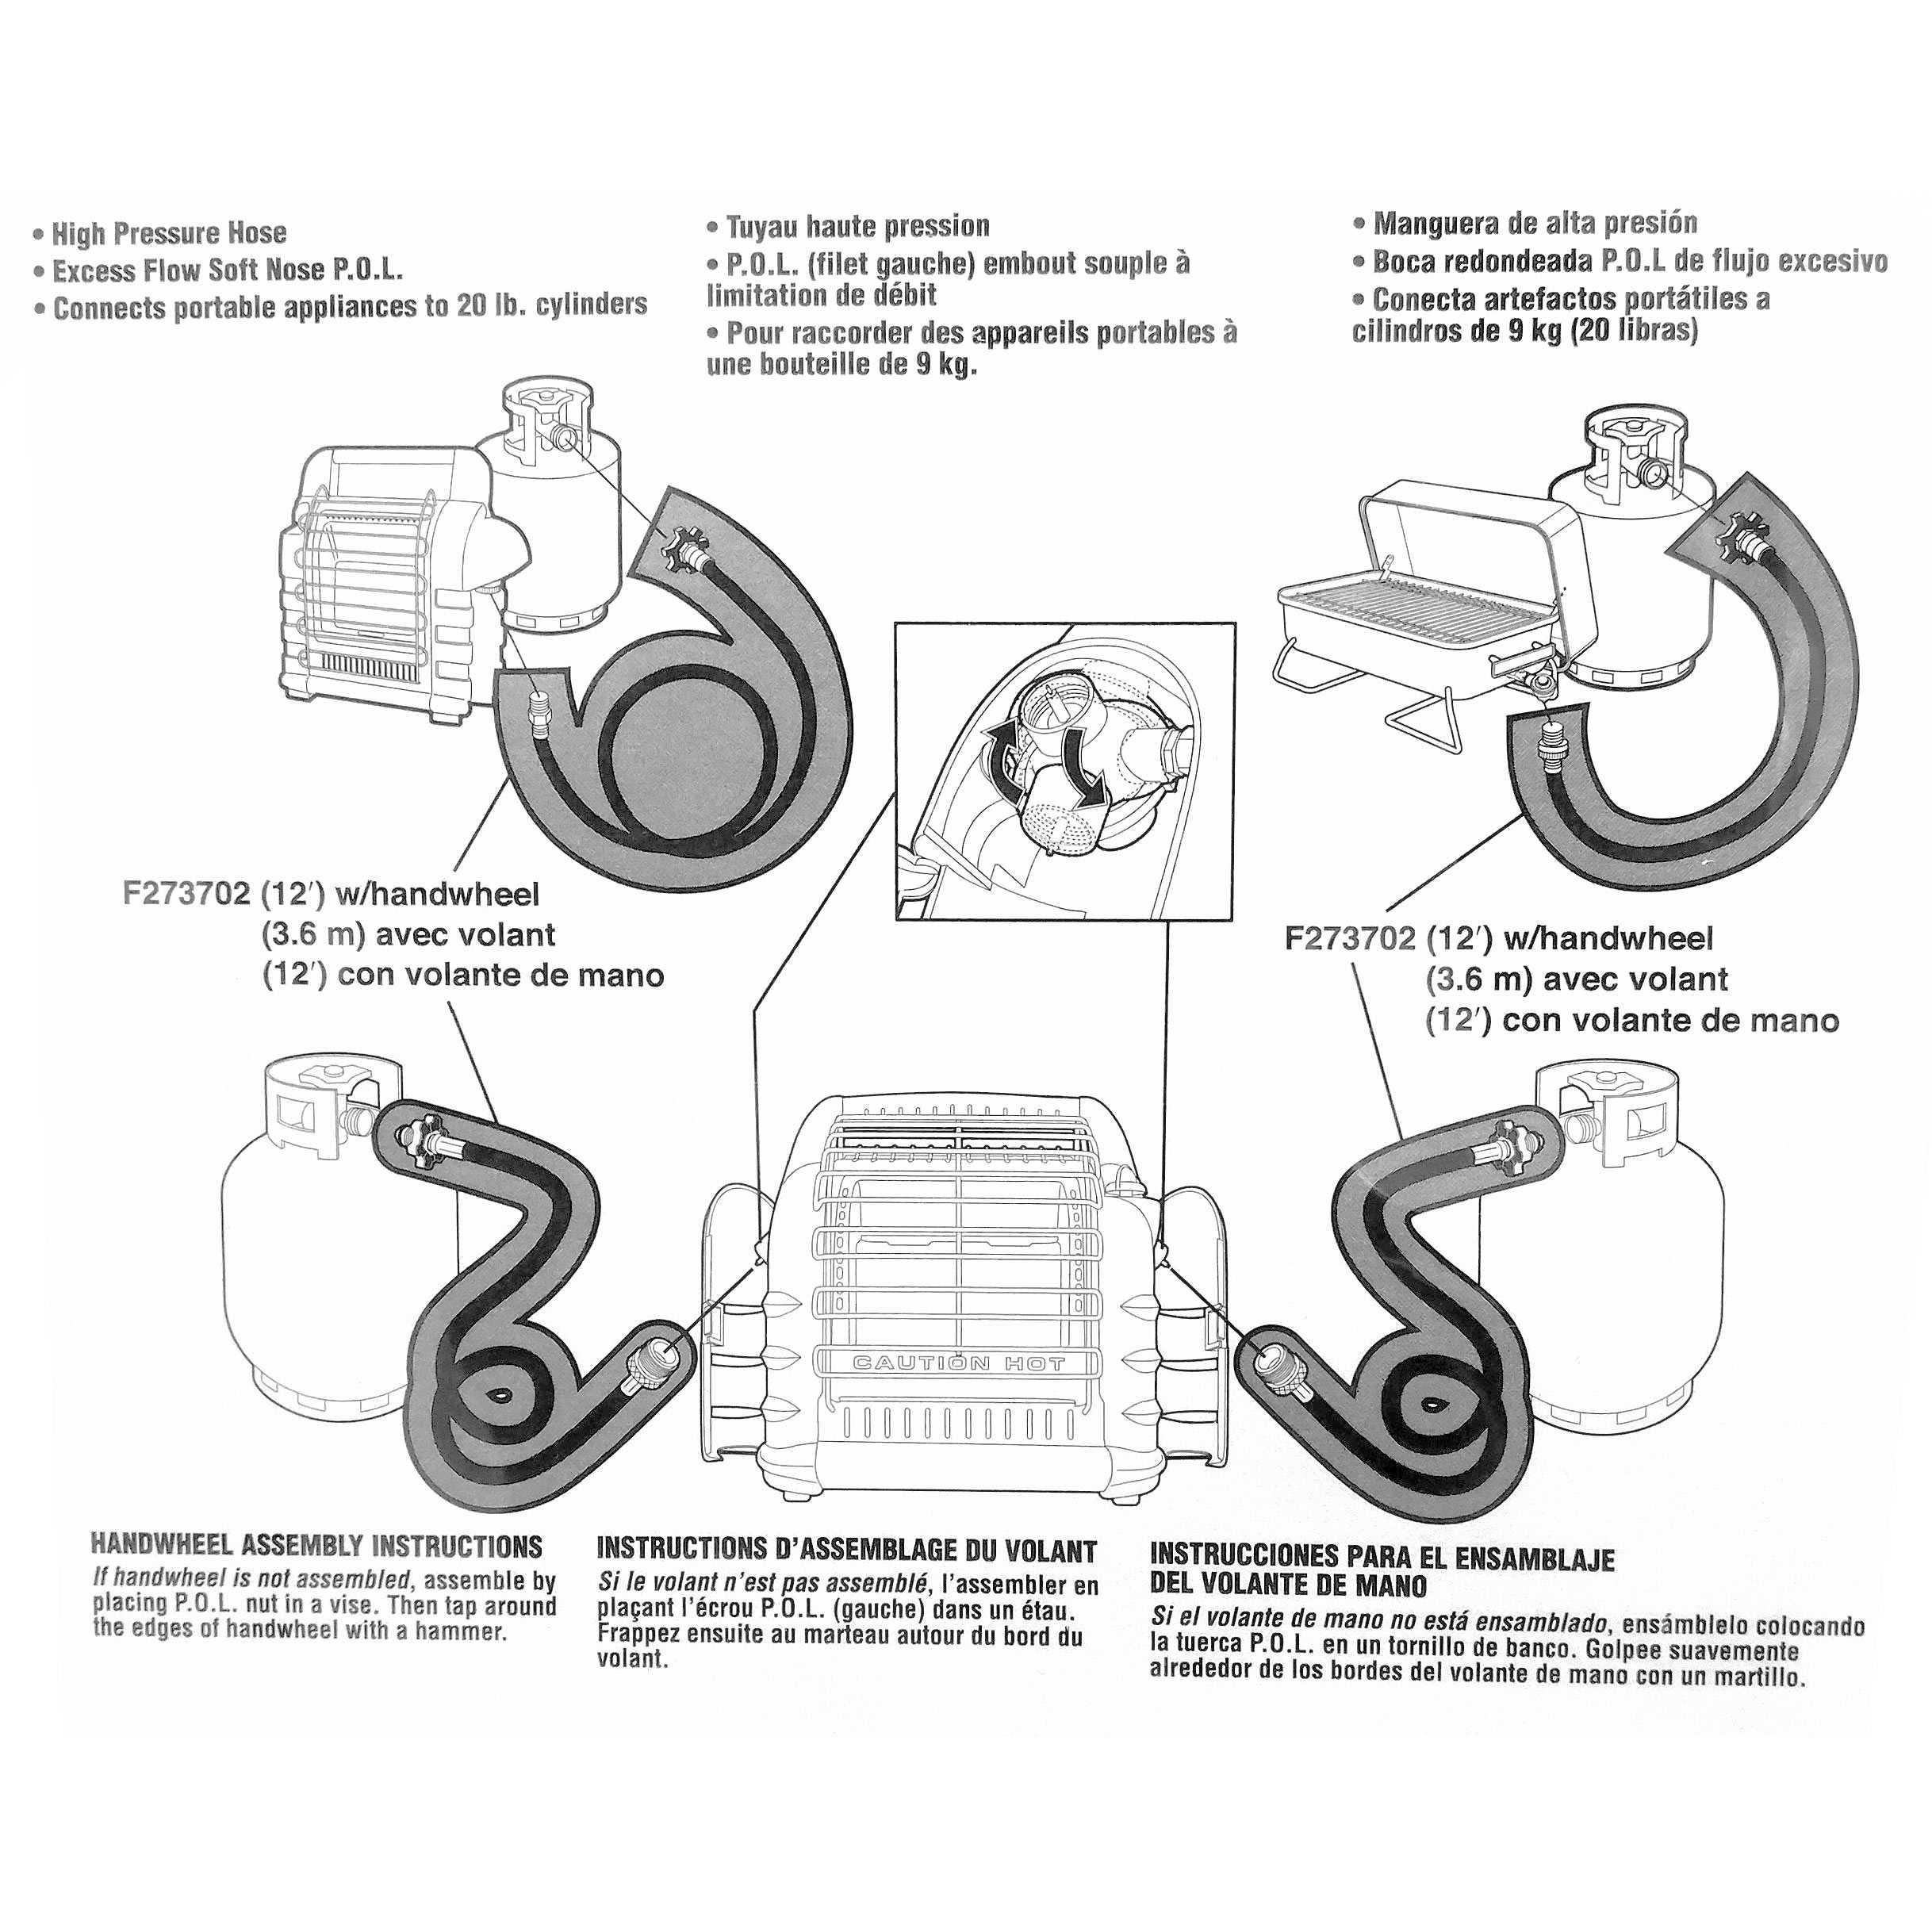 Mr Heater 12 Foot Propane Hose Throwaway Cylinder To Bulk Propane Big Buddy Heater  Wiring Diagram Mr. Heater Diagram